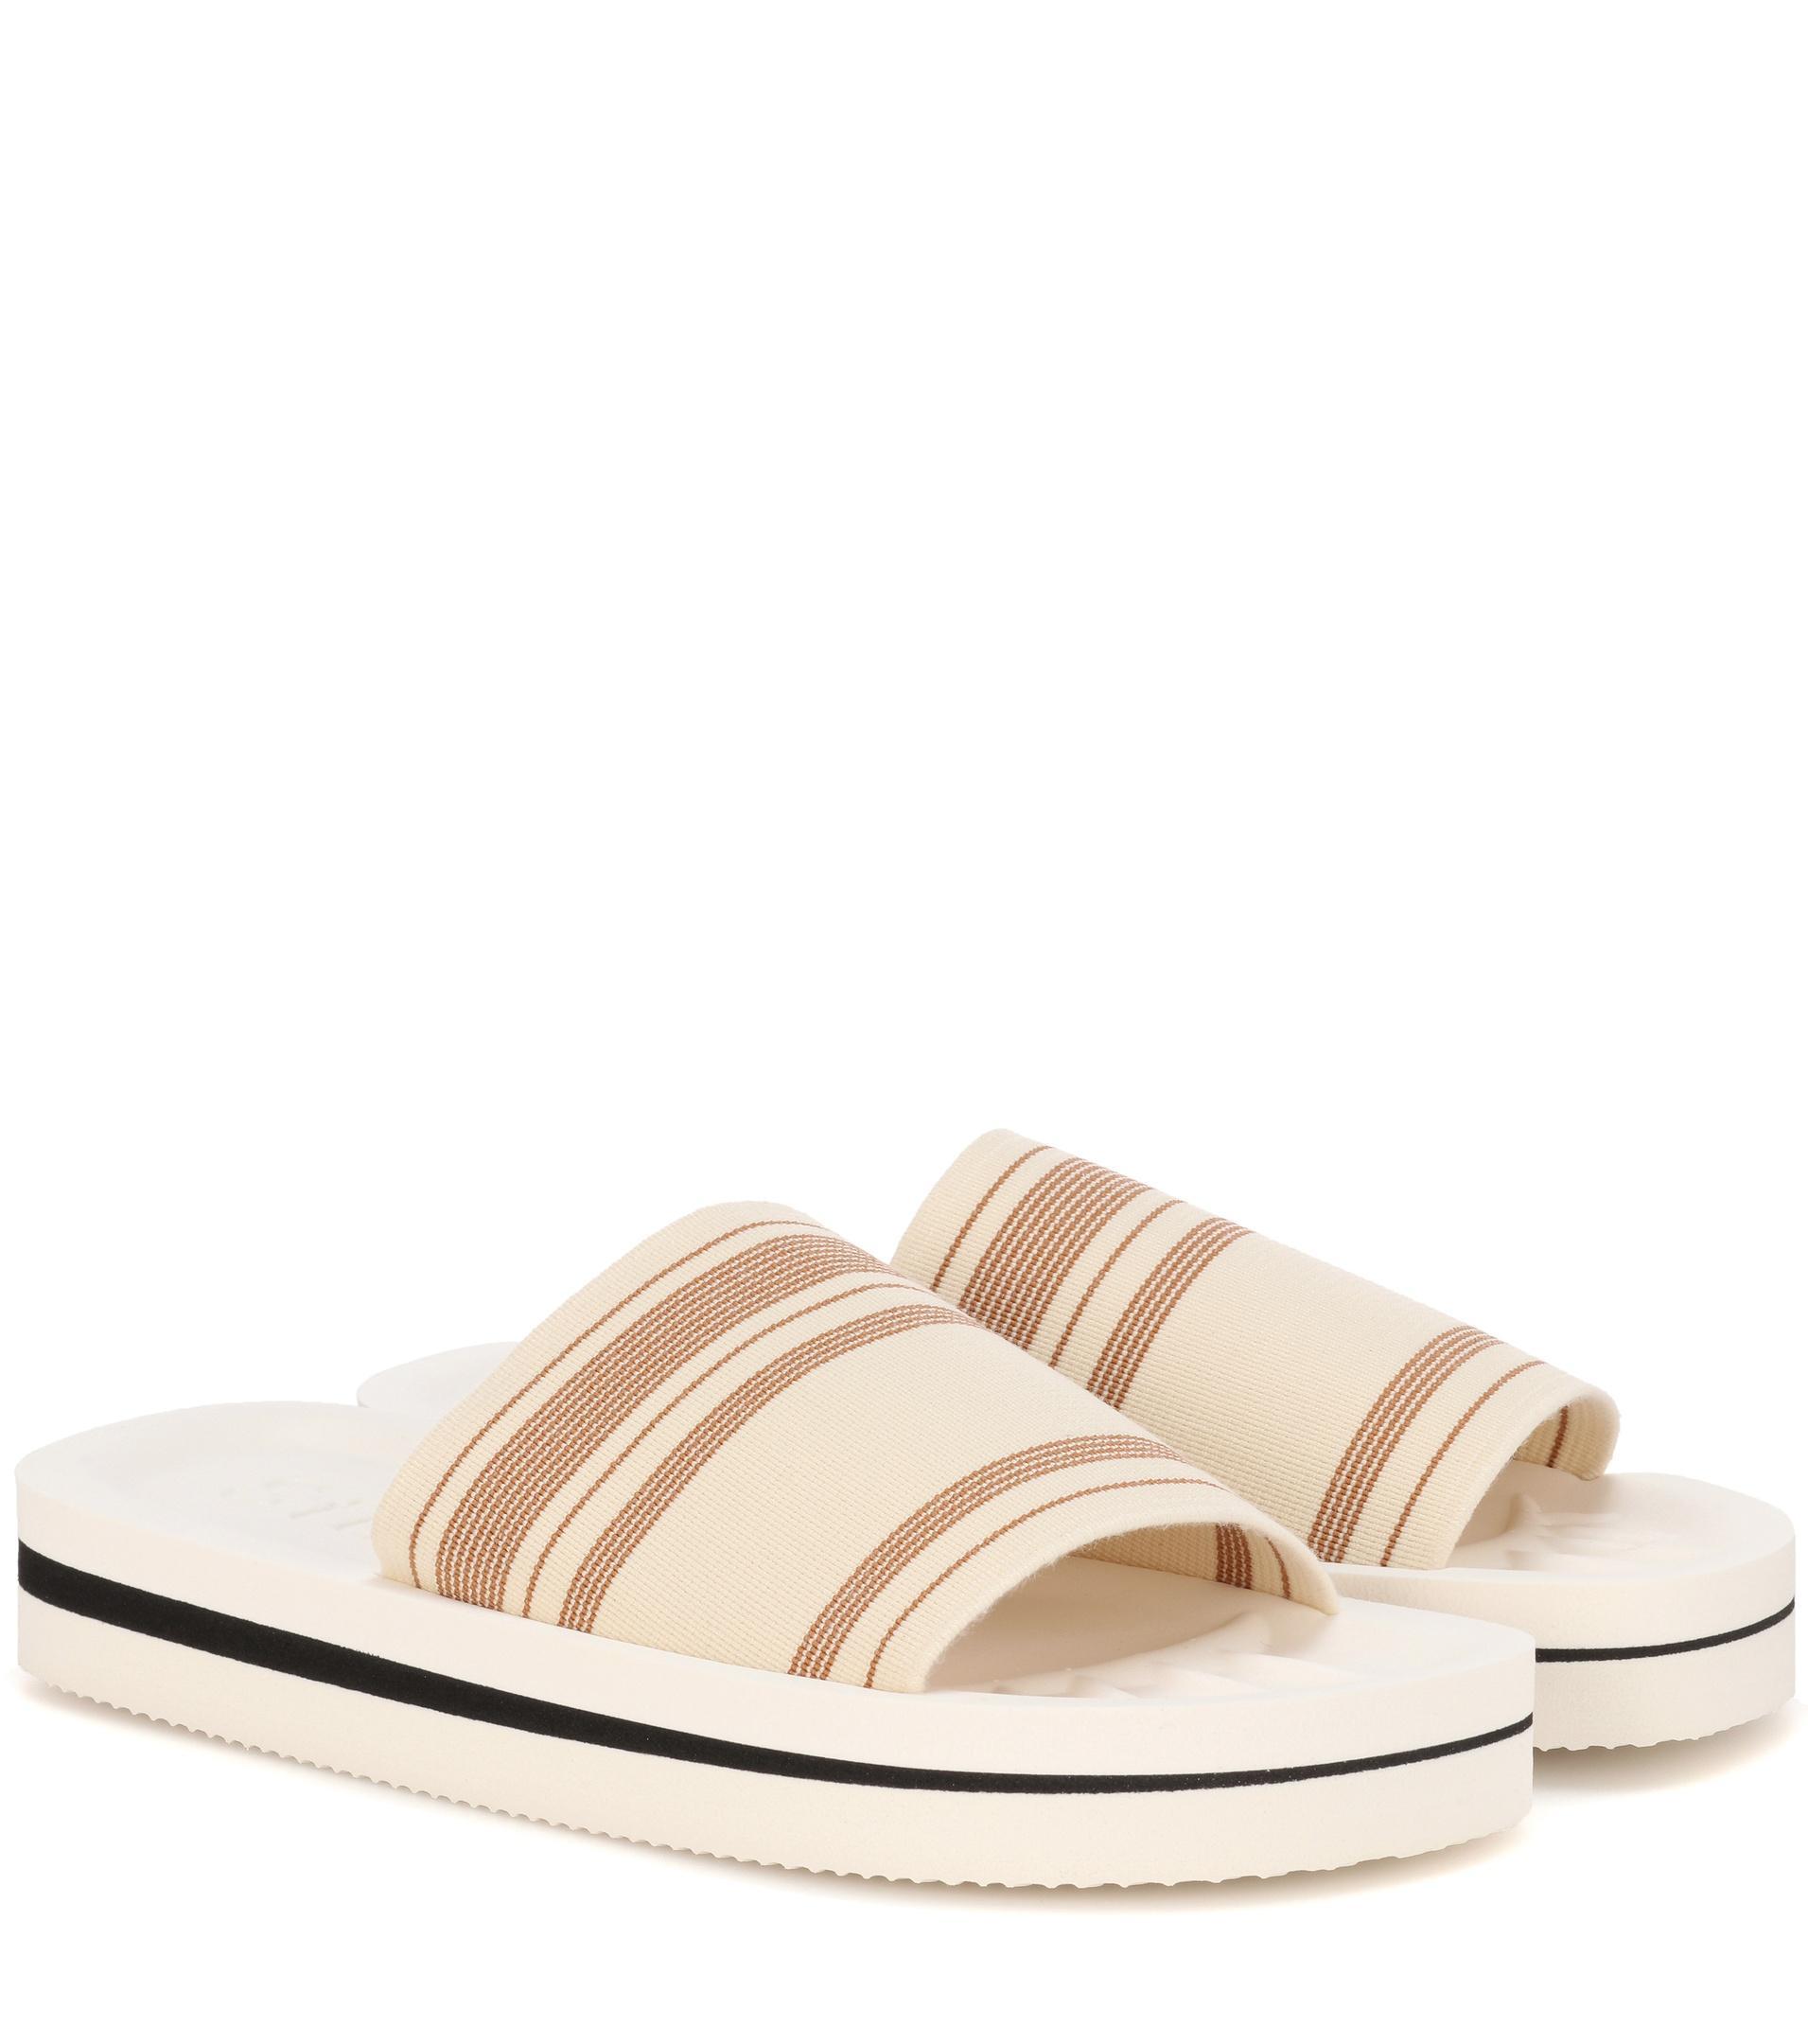 Acne Tania printed slip-on sandals x9qogCW0